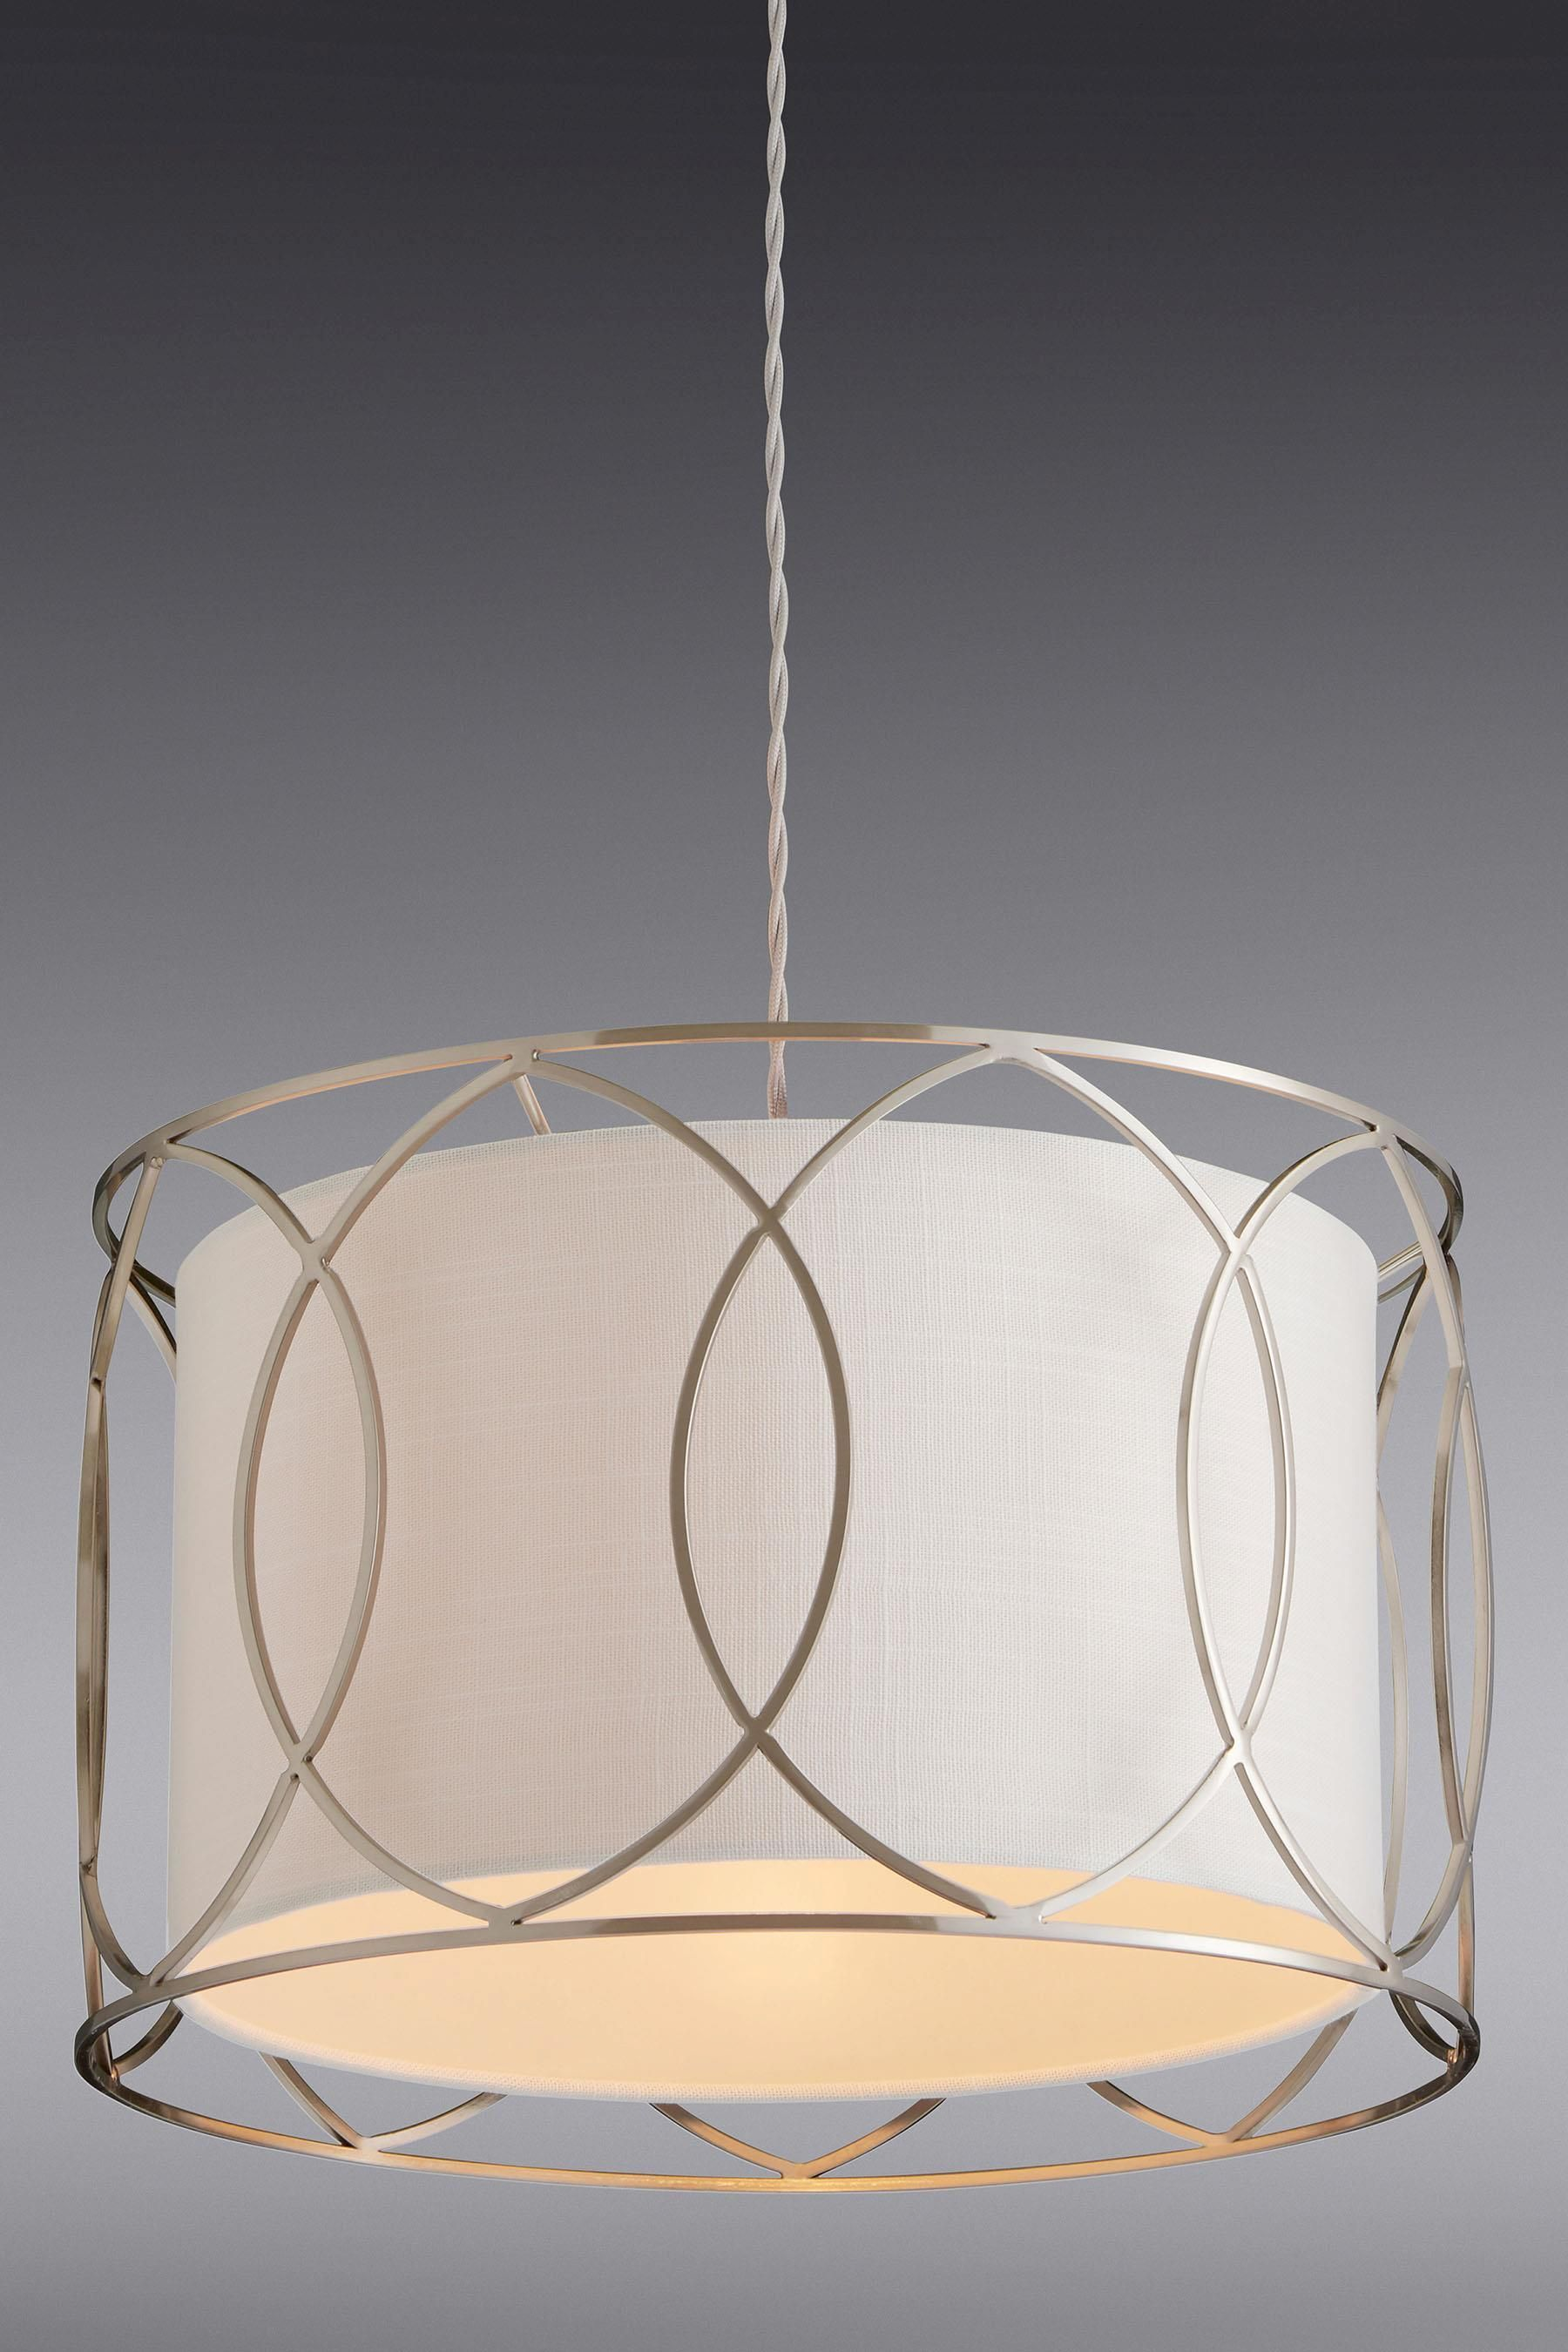 Buy Claridge Easy Fit Pendant From The Next Uk Online Shop Ceiling Lights Uk Ceiling Lights Bedroom Ceiling Light